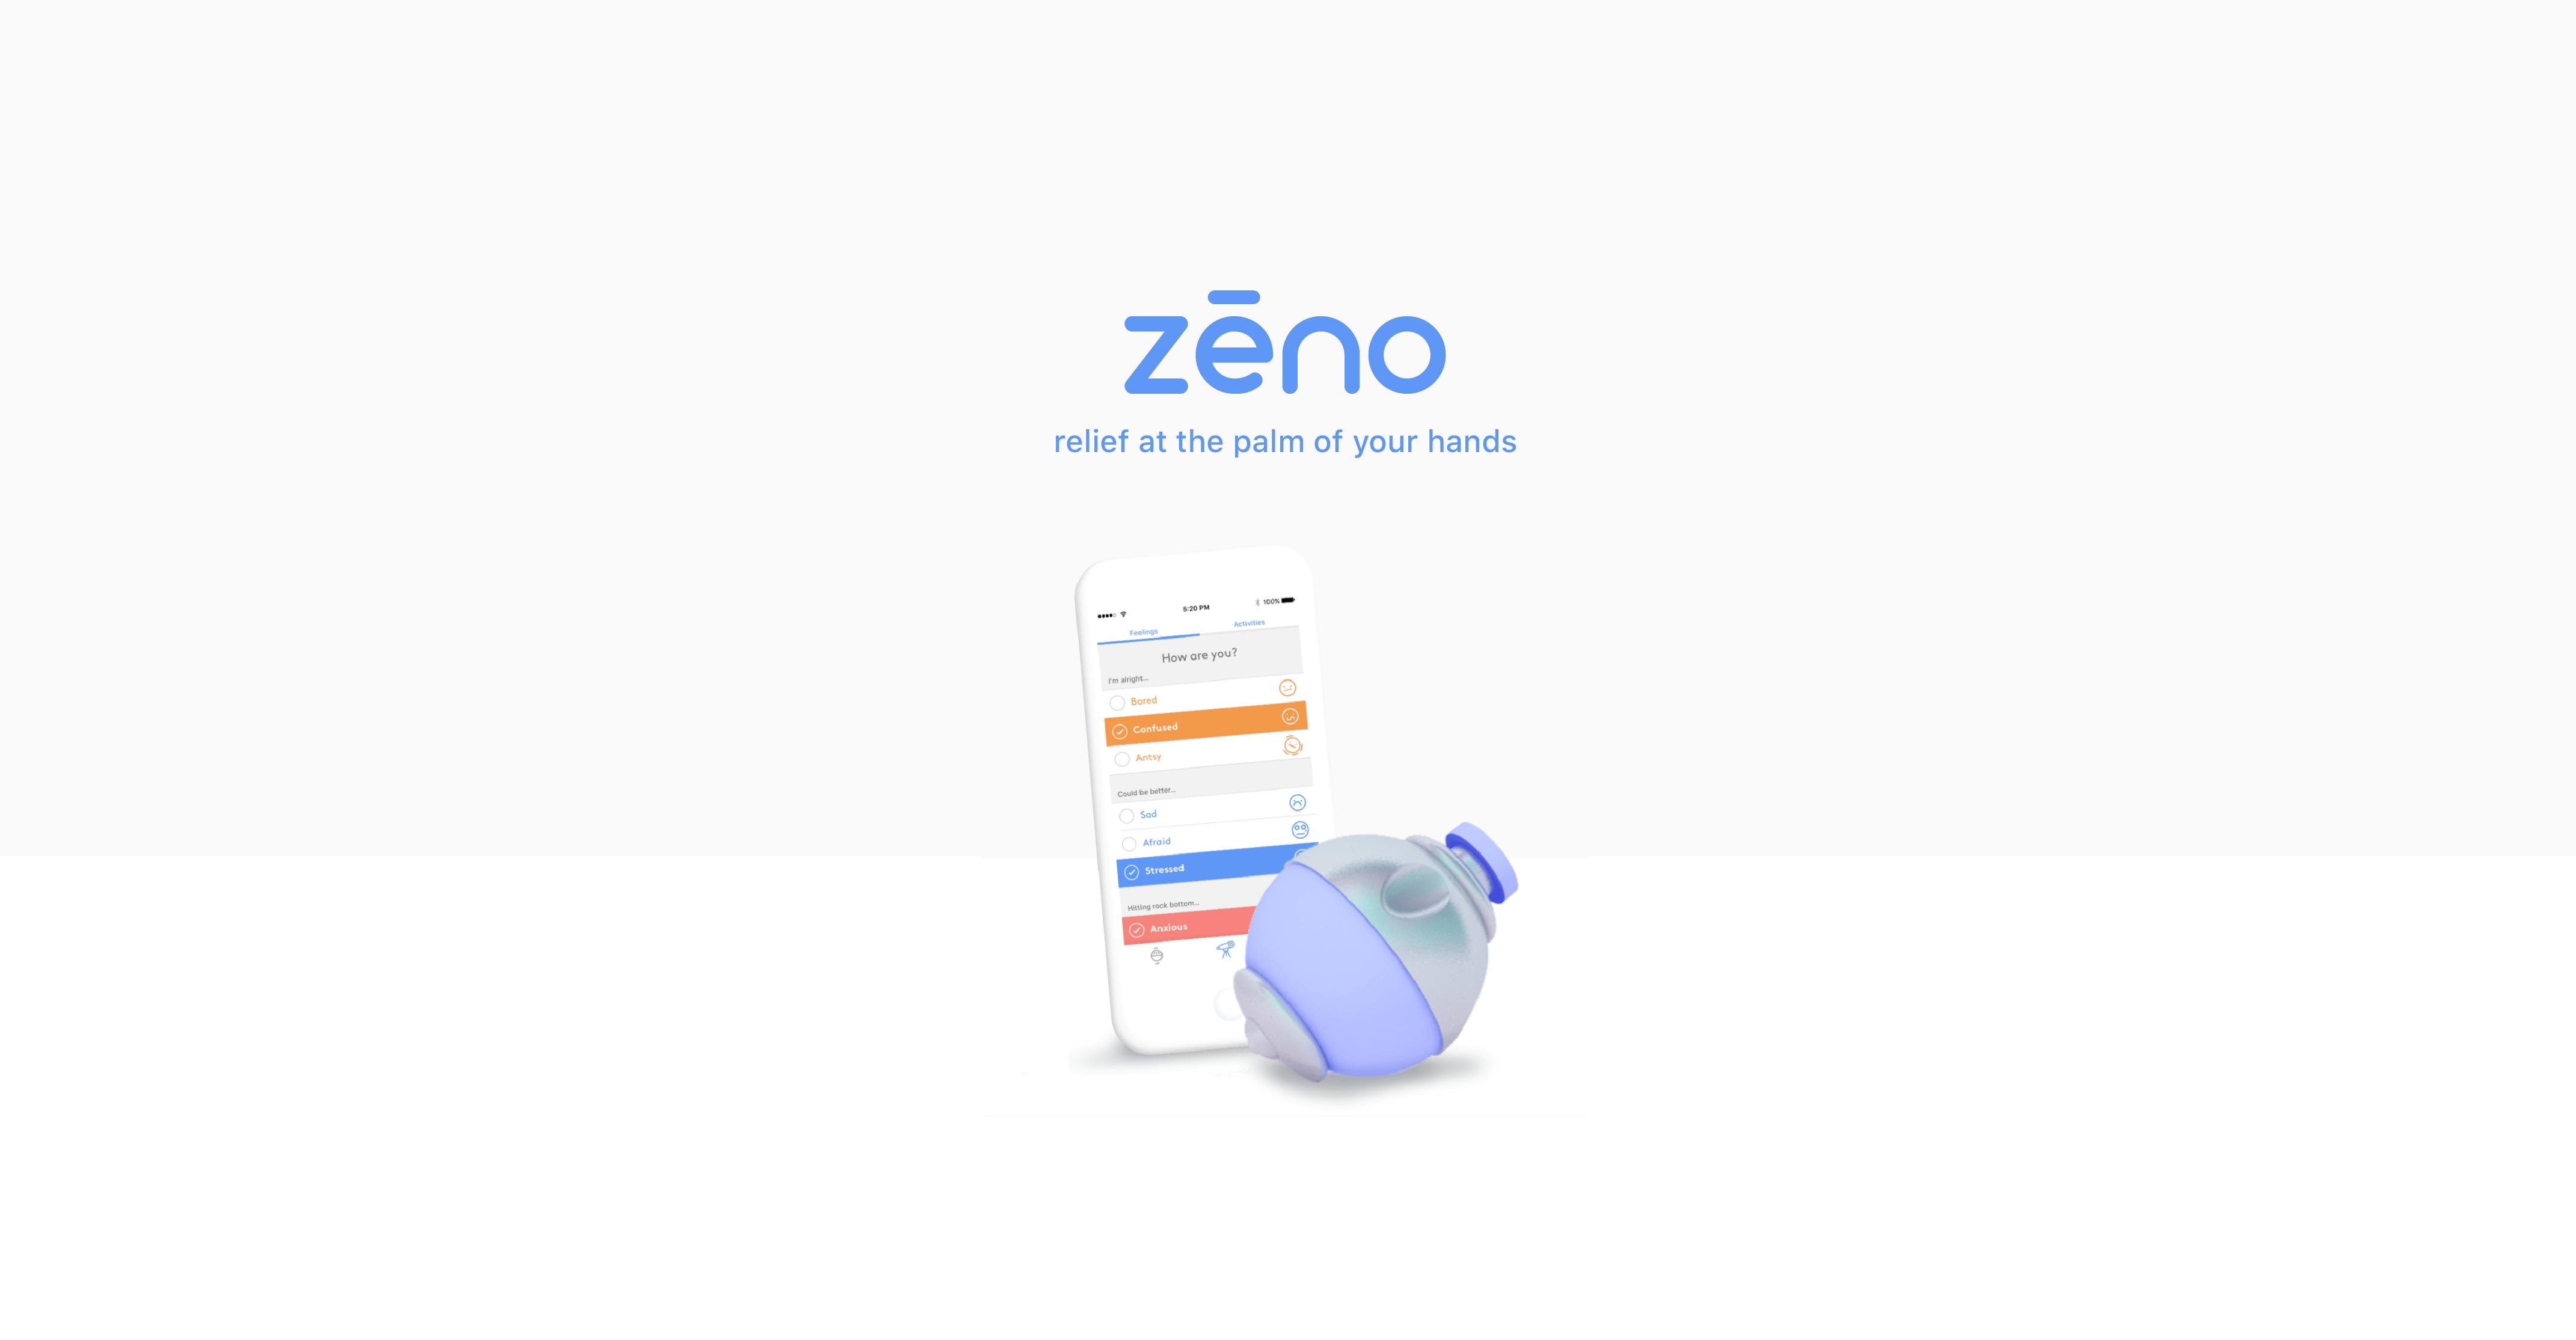 zeno-01